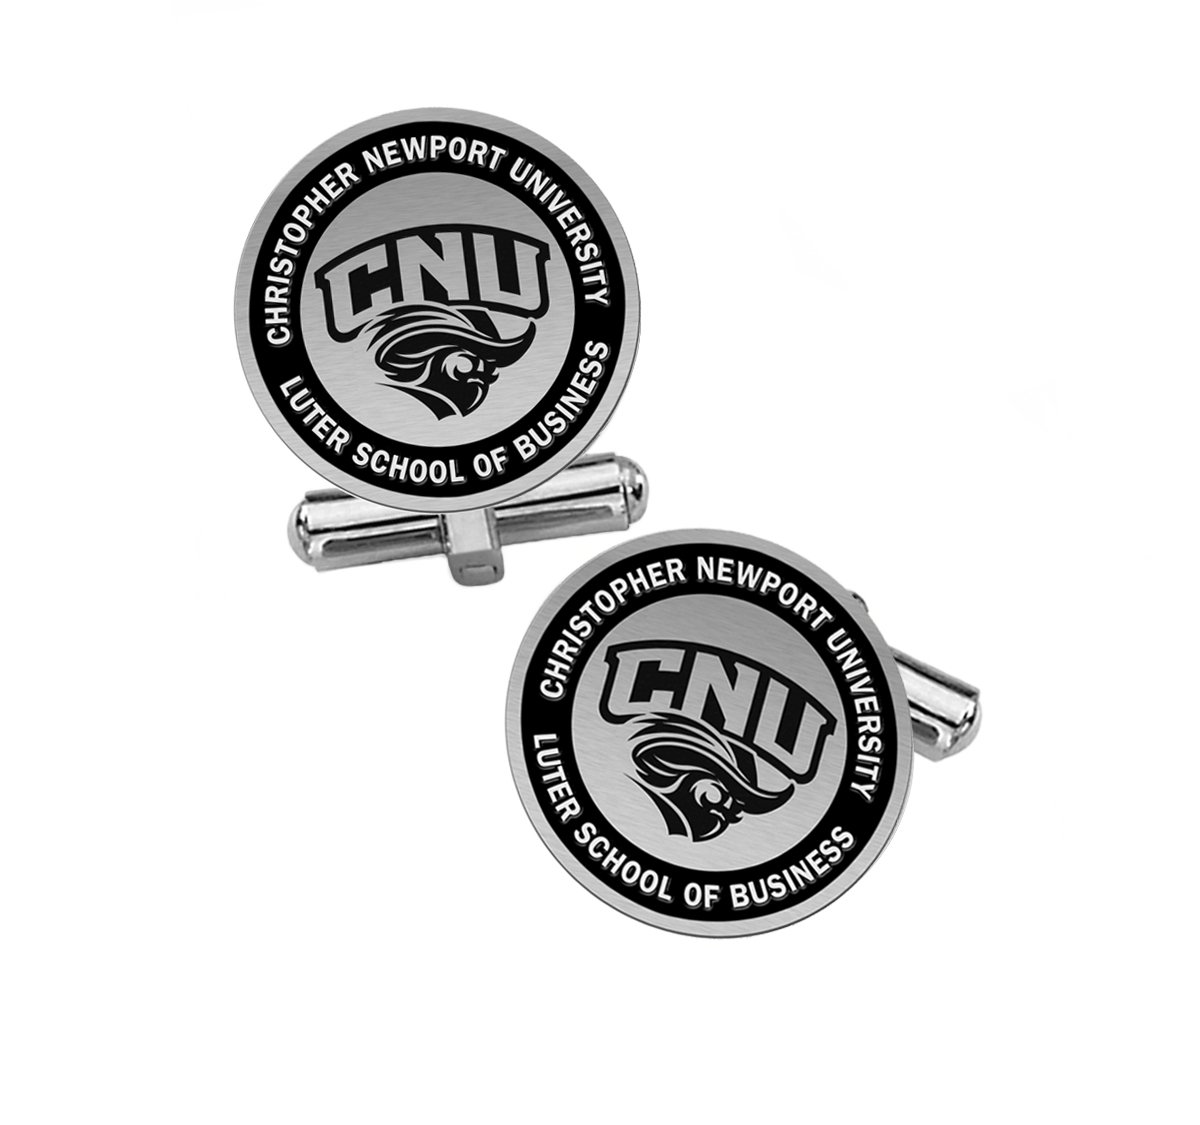 Luter School of Business Cuff Links | Christopher Newport University